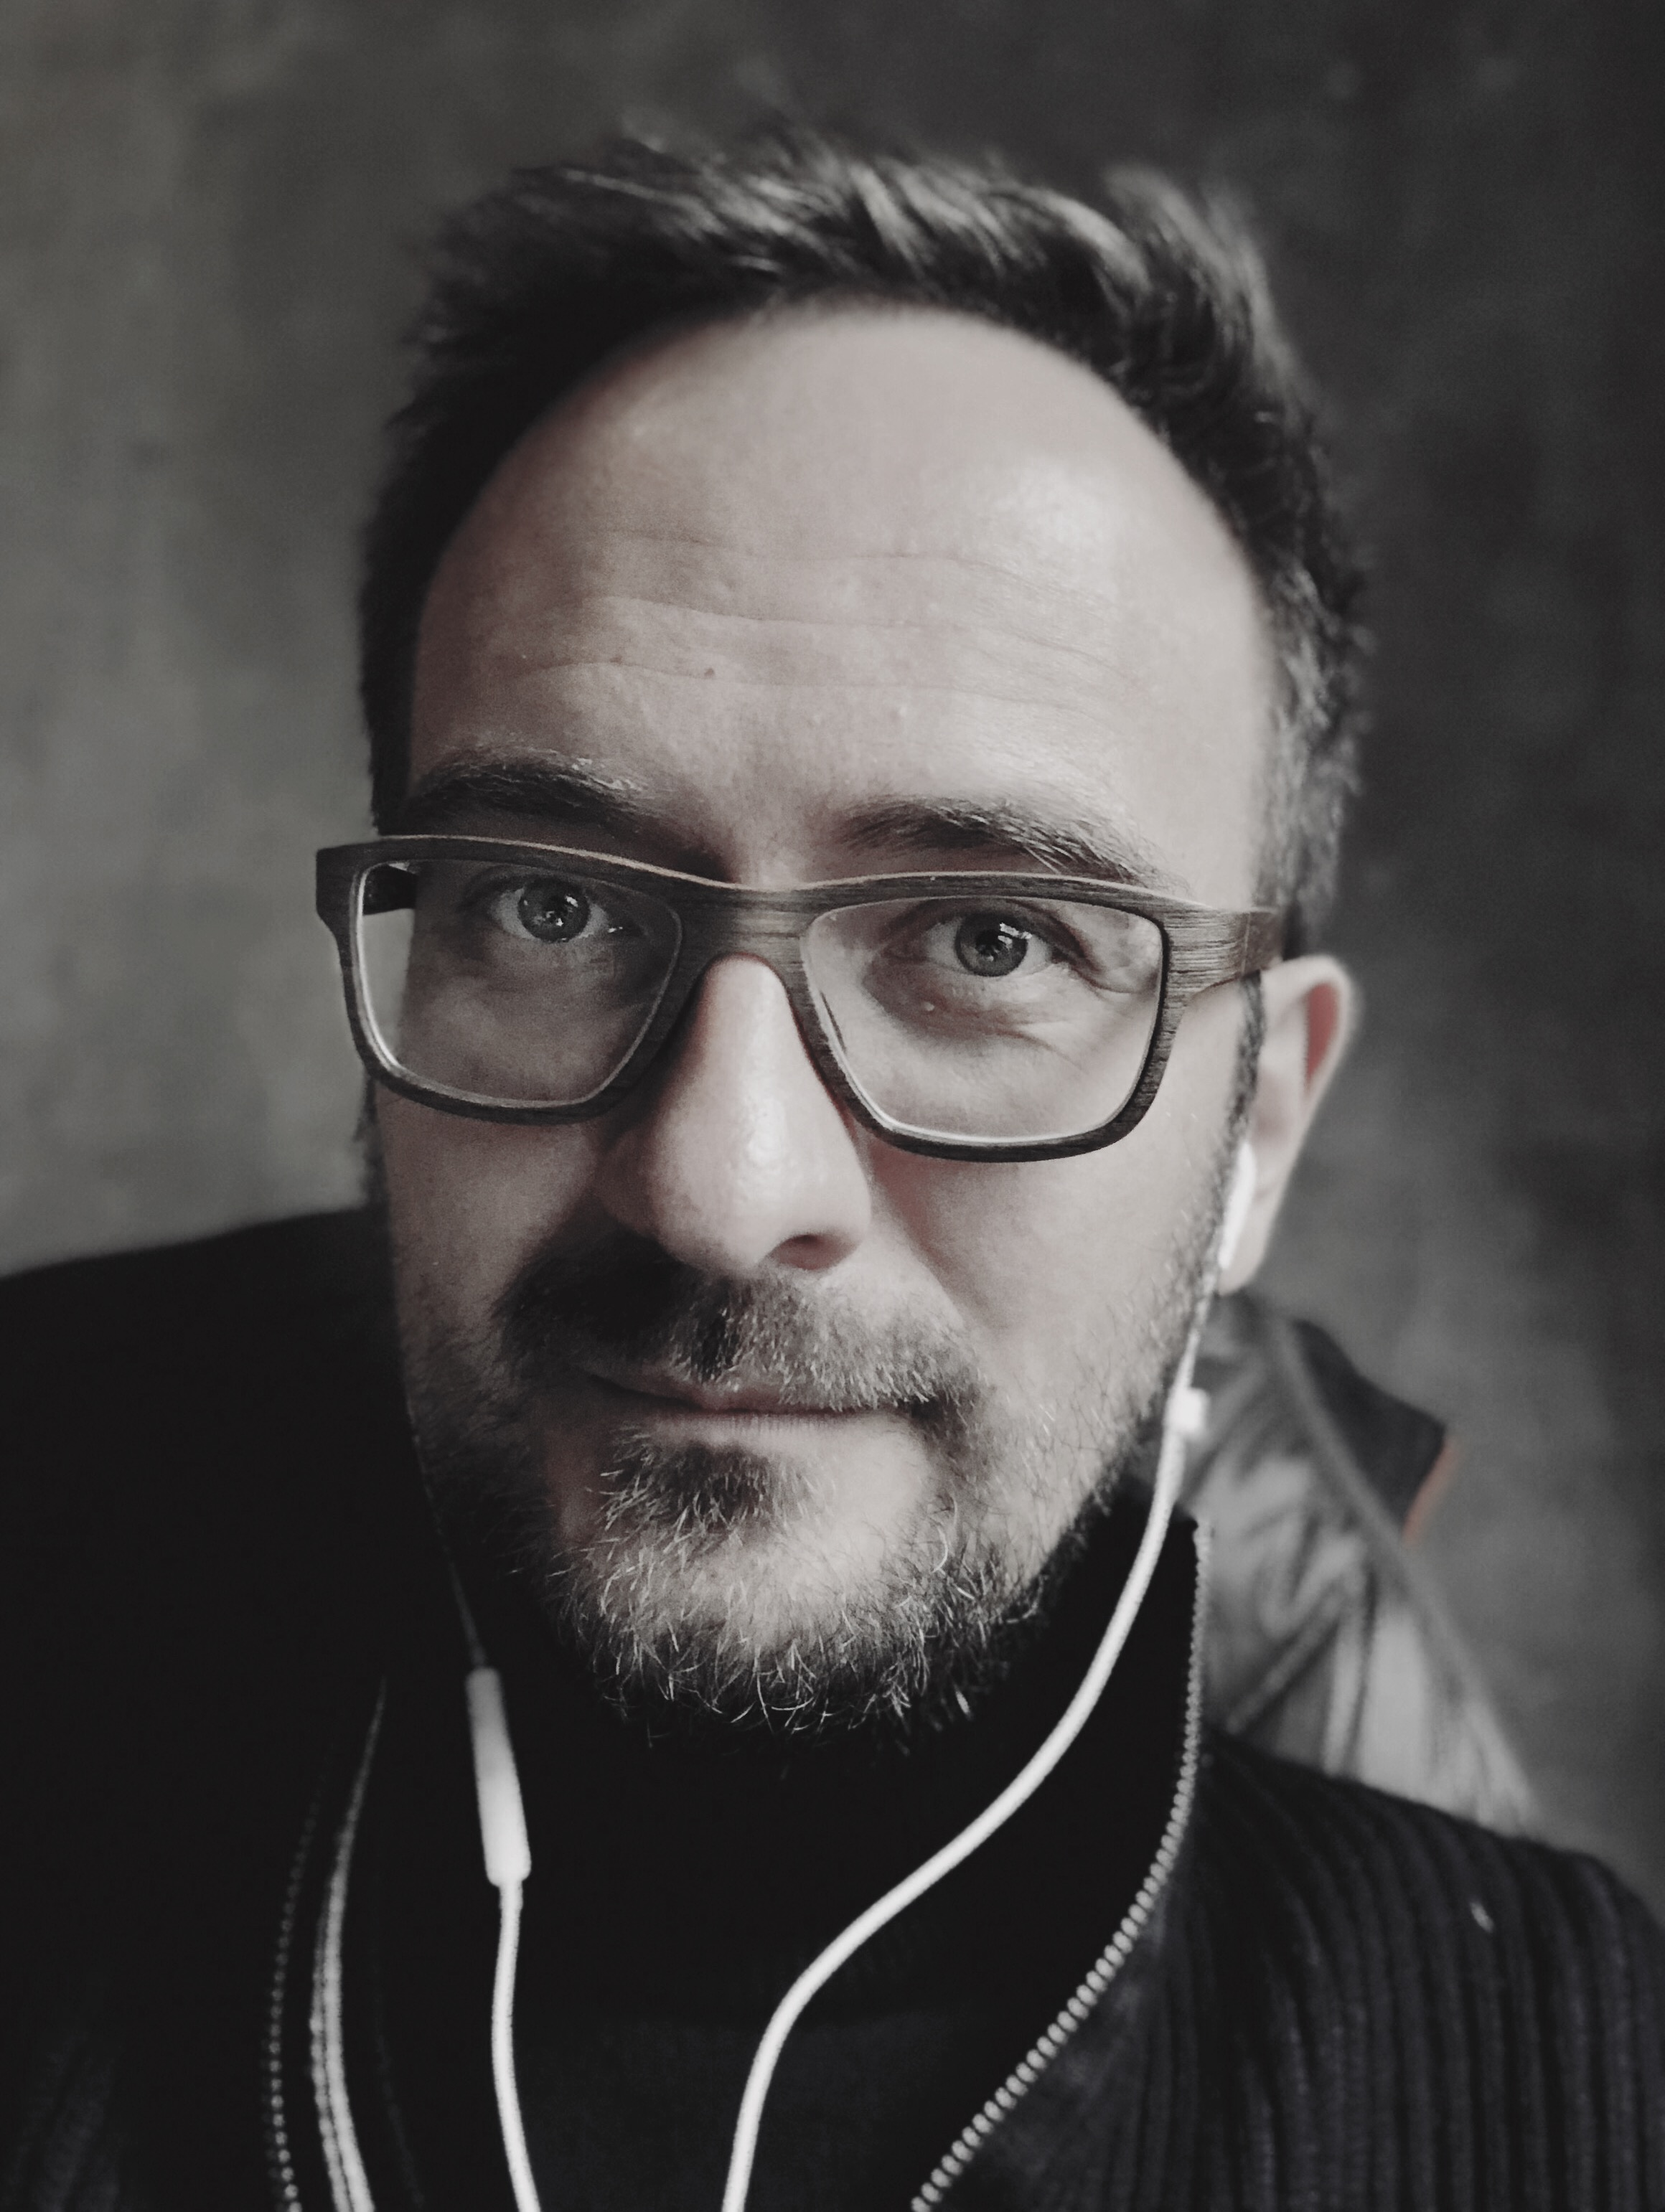 radek wegrzyn / CEO, producer, director